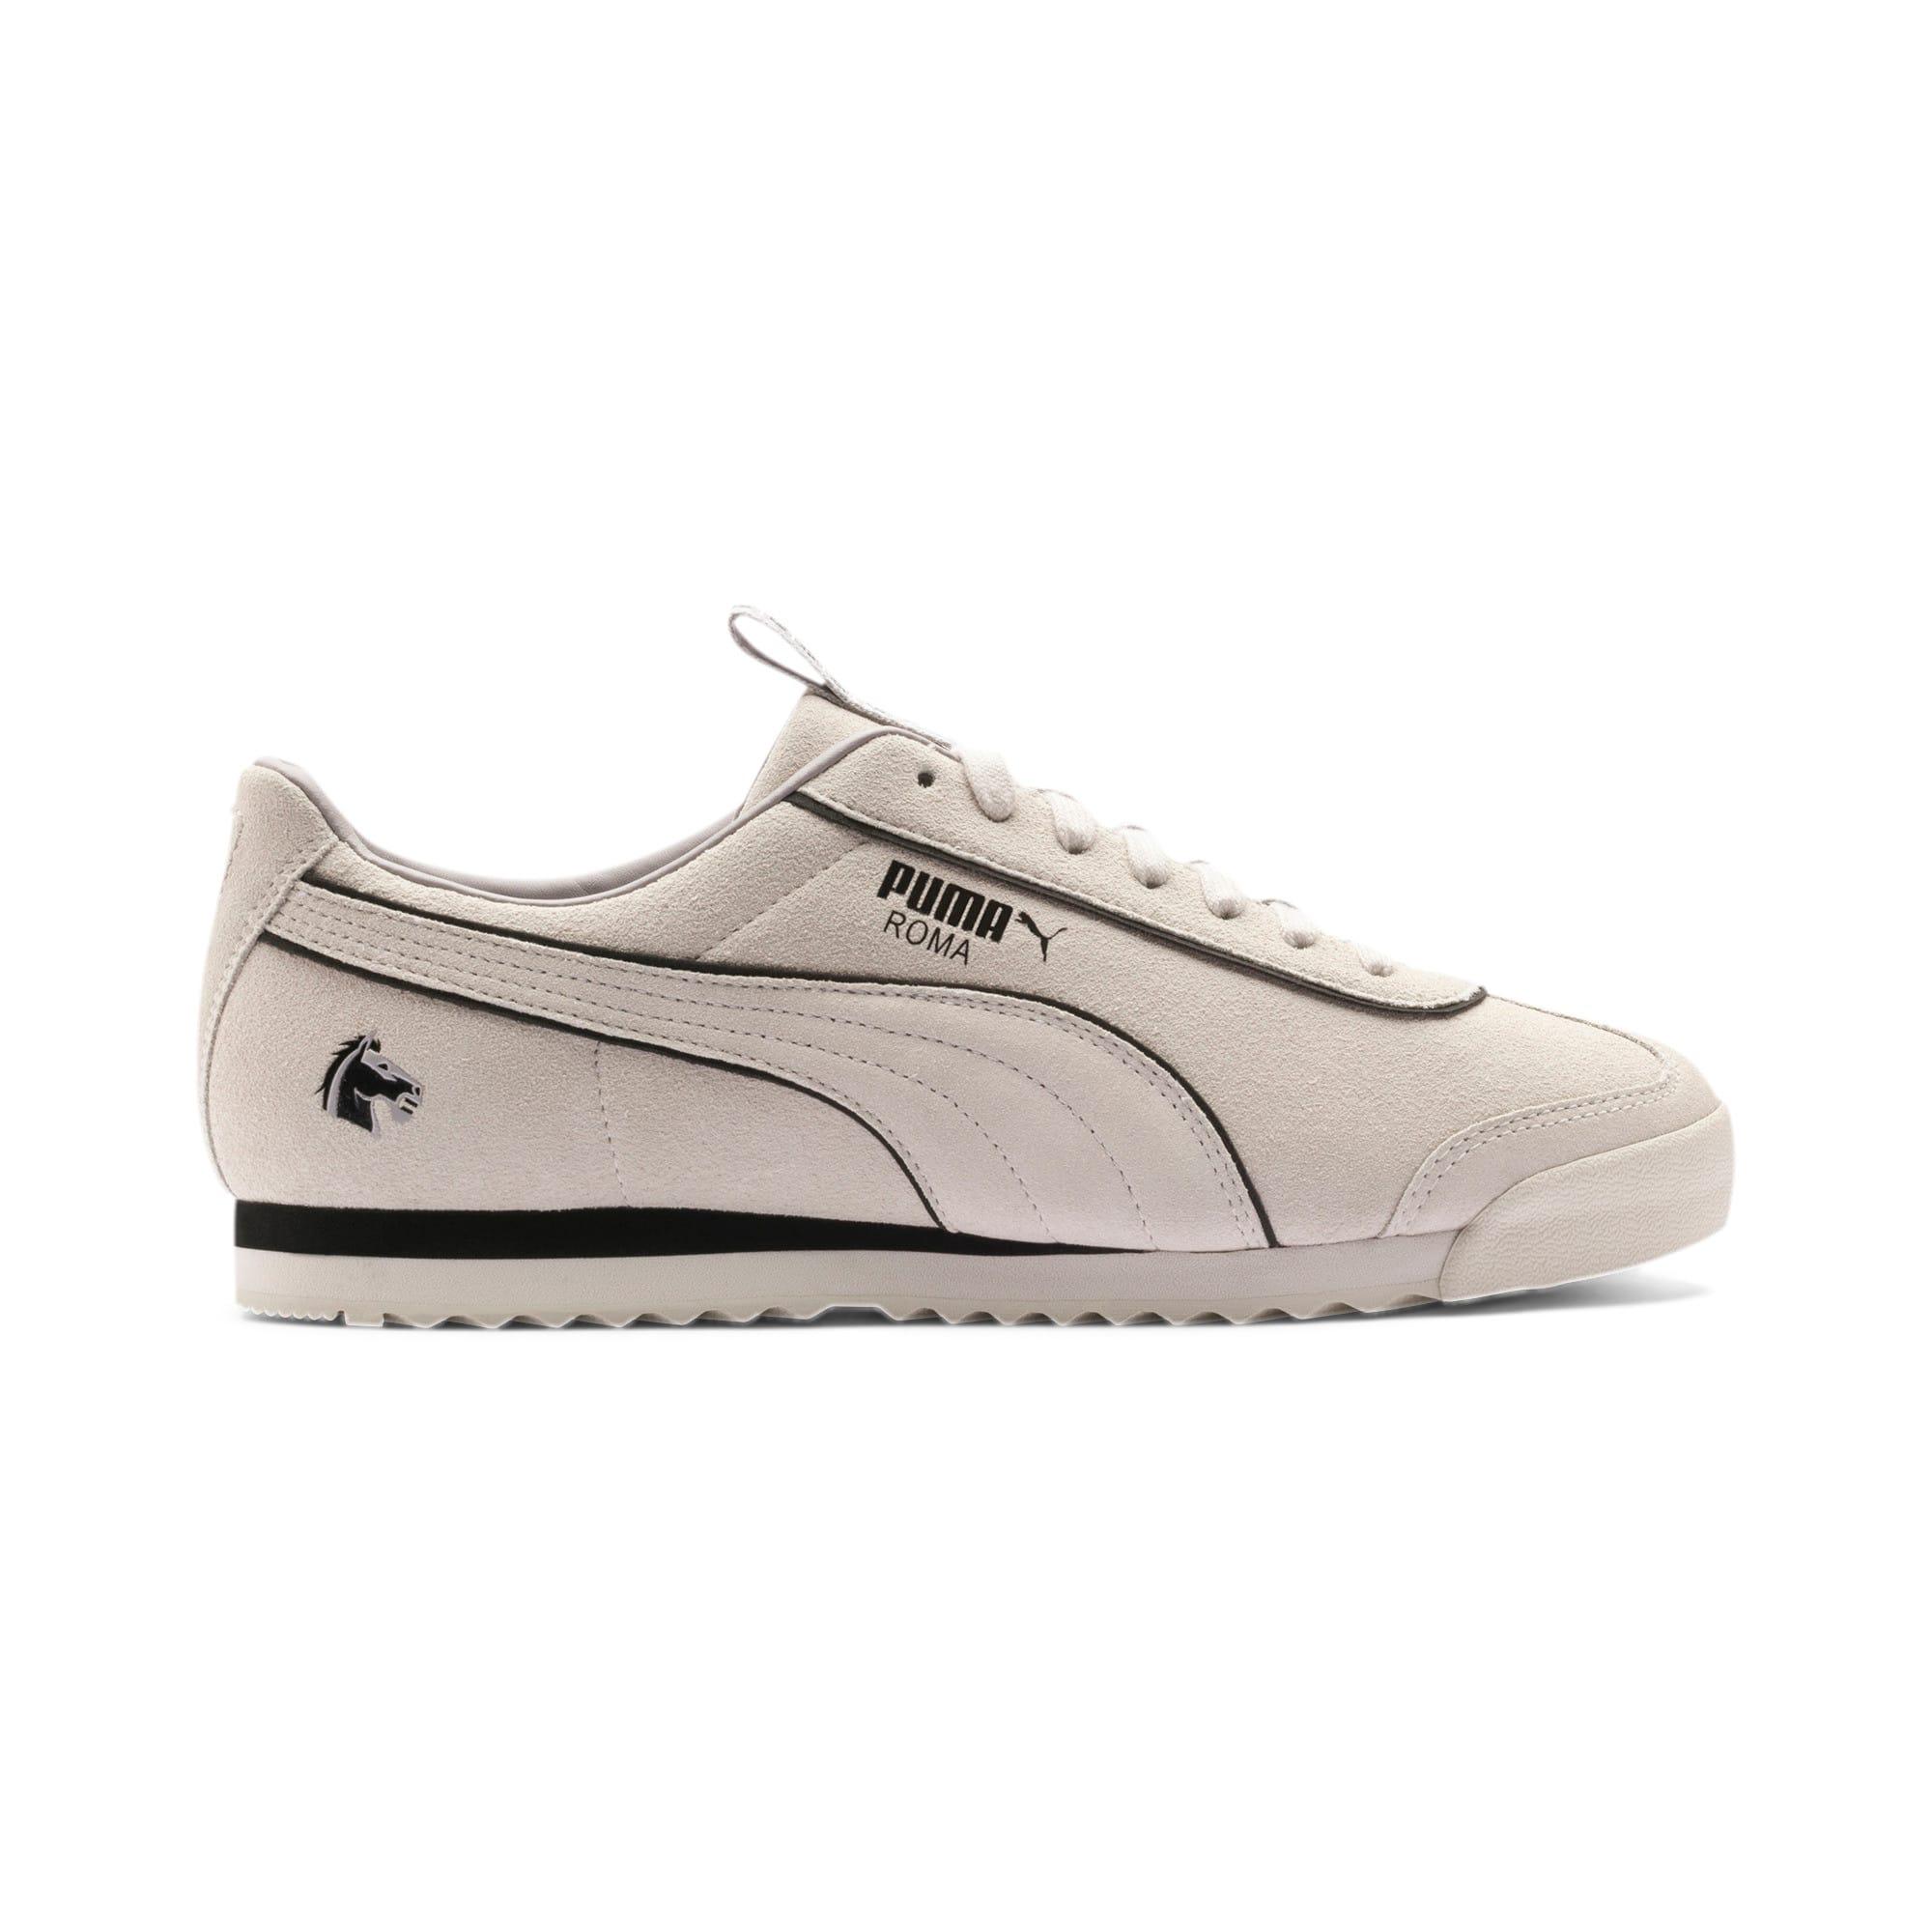 Miniatura 7 de Zapatos deportivos PUMA x THE GODFATHER Roma Woltz, WINDCHIME-Puma negro, mediano